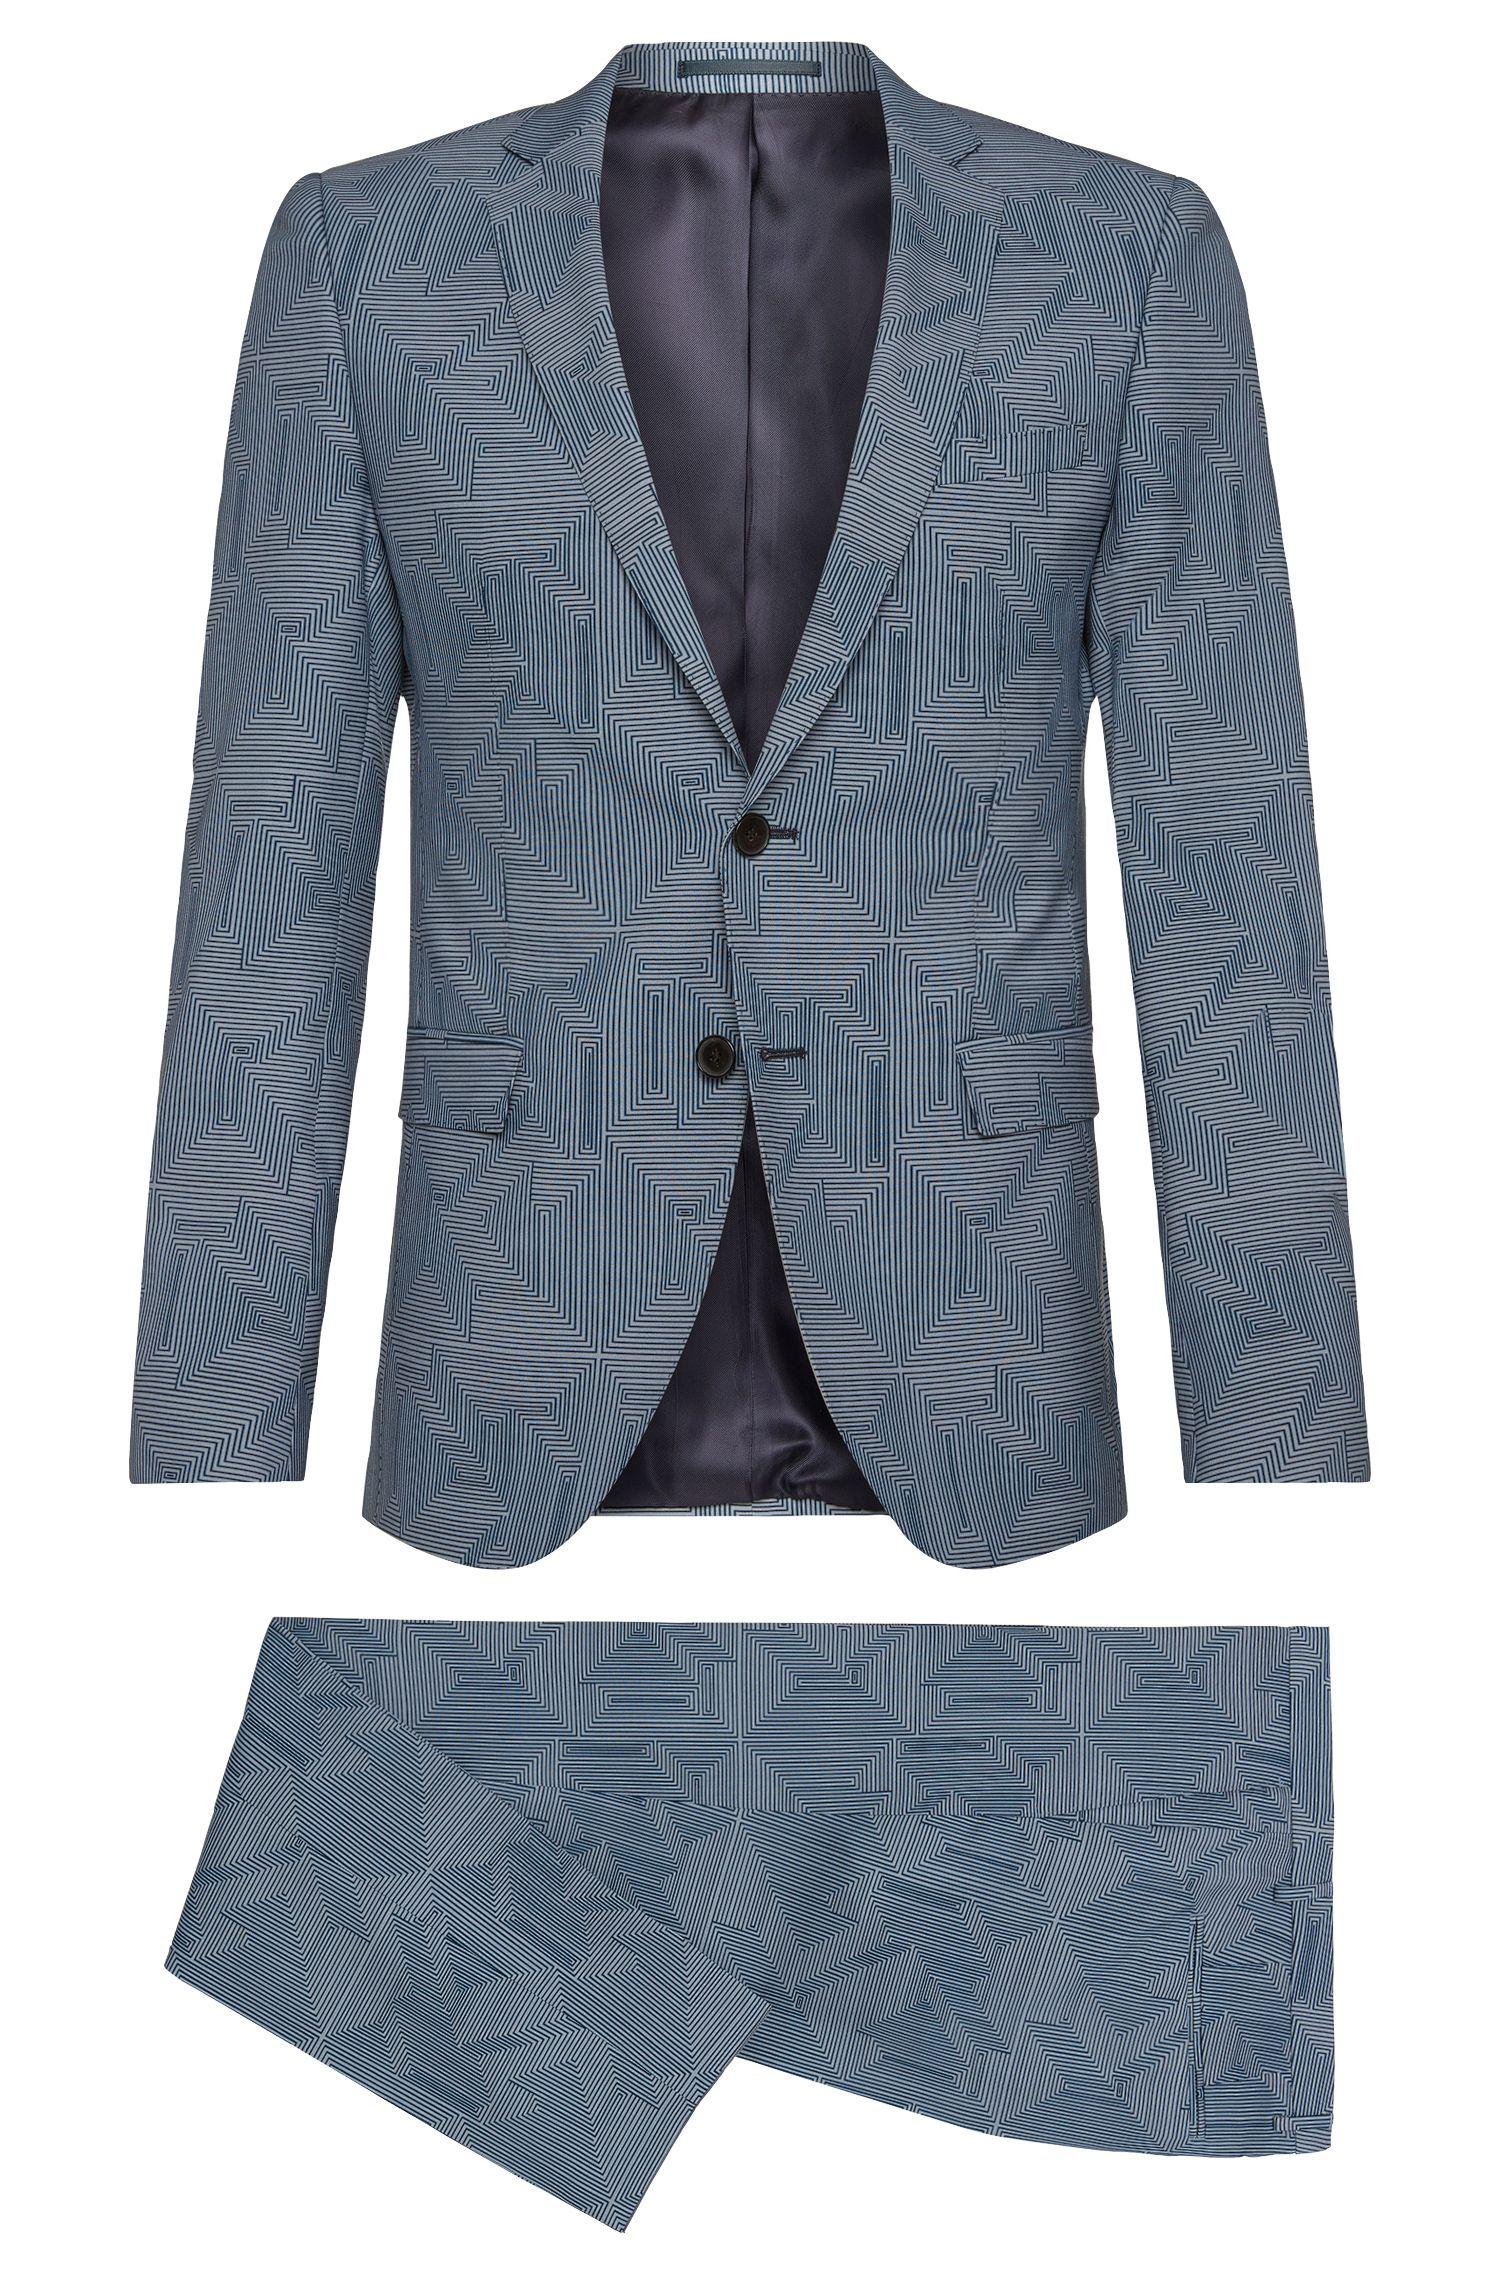 'Rocco/Wyatt' | Slim Fit, Italian Virgin Wool Patterned Suit